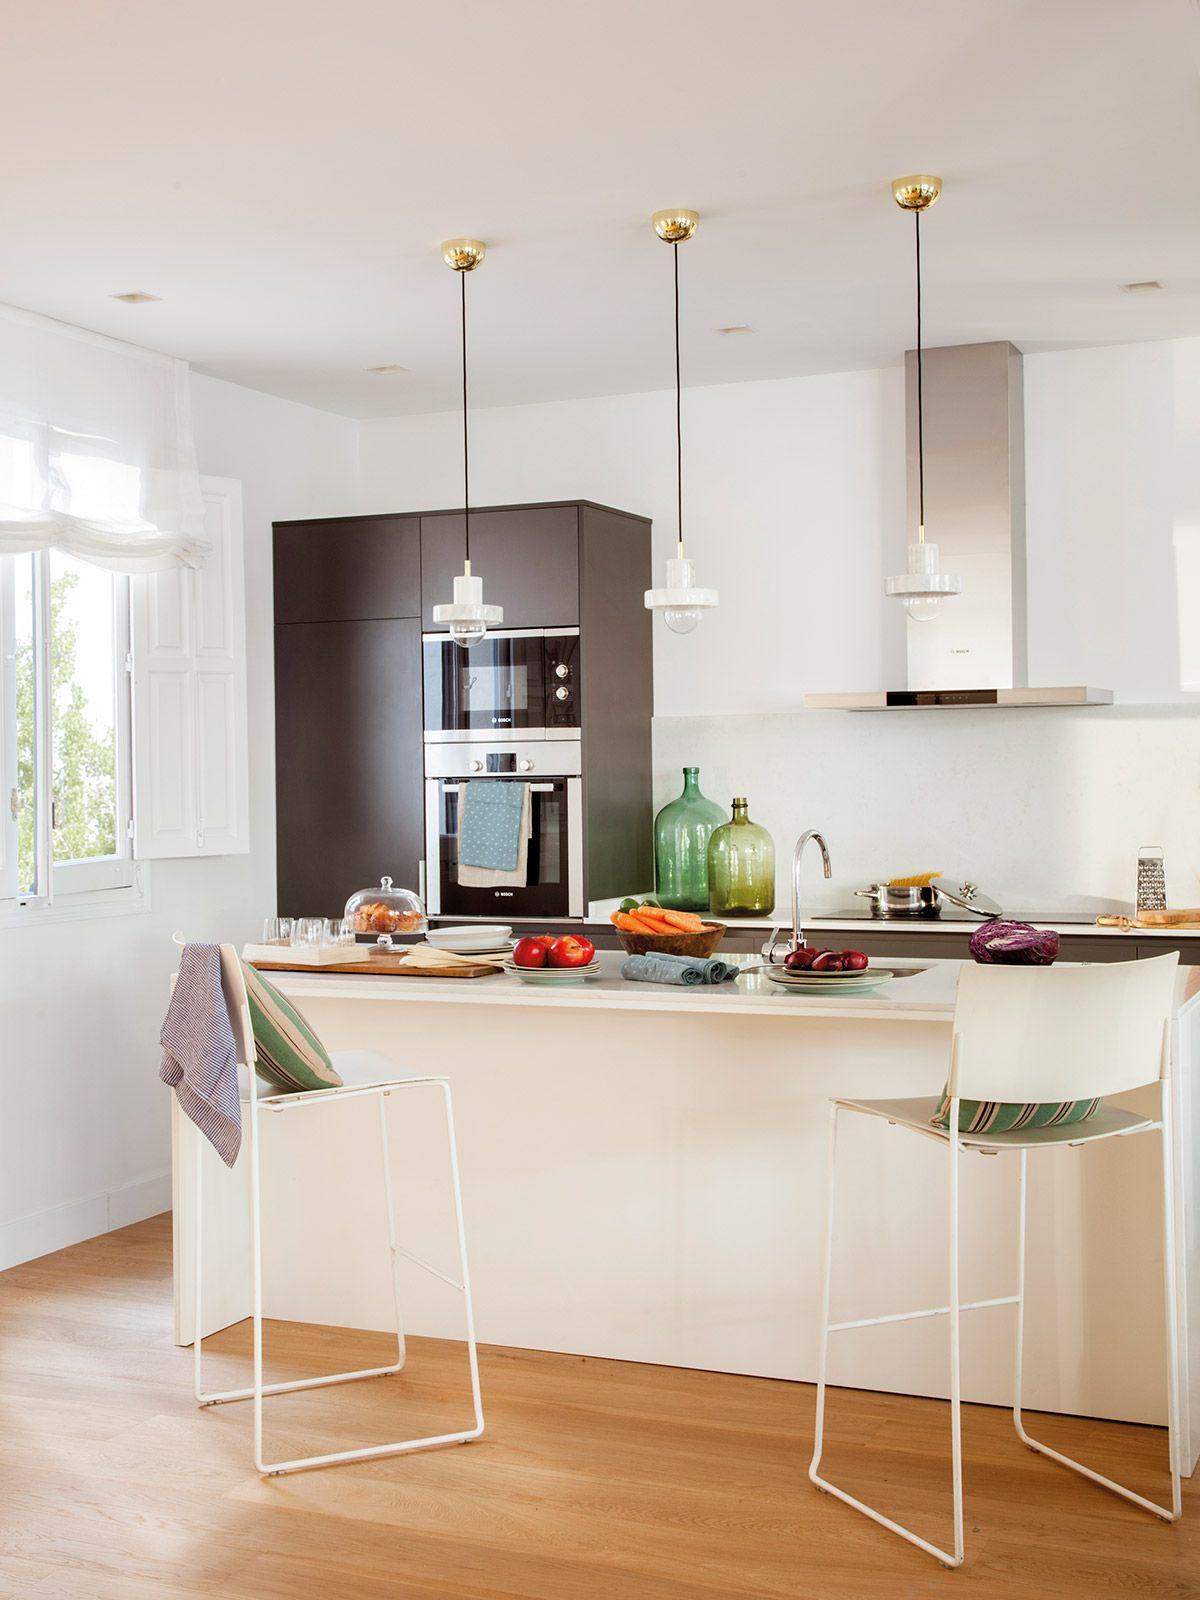 Desayuno comida o cena en la cocina cocinas pinterest for Disenos de cocinas pequenas con barra